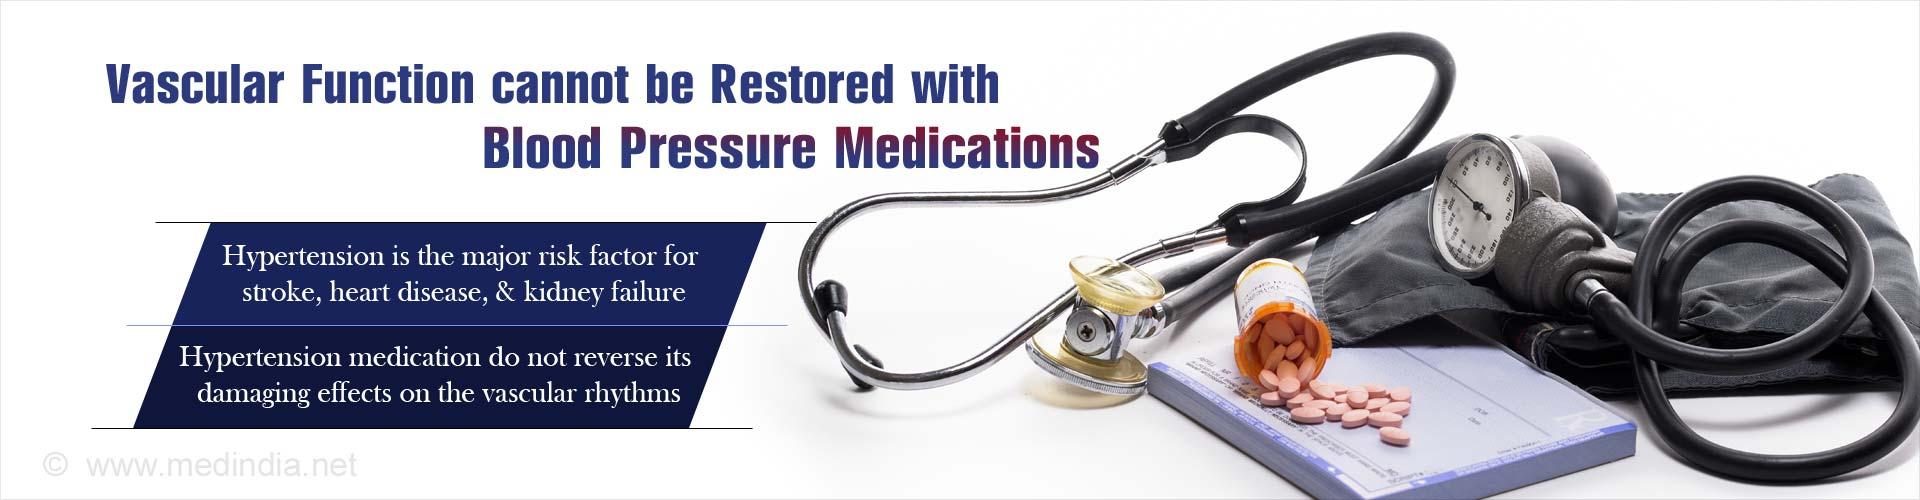 Hypertension Medications Do Not Restore Vascular Function